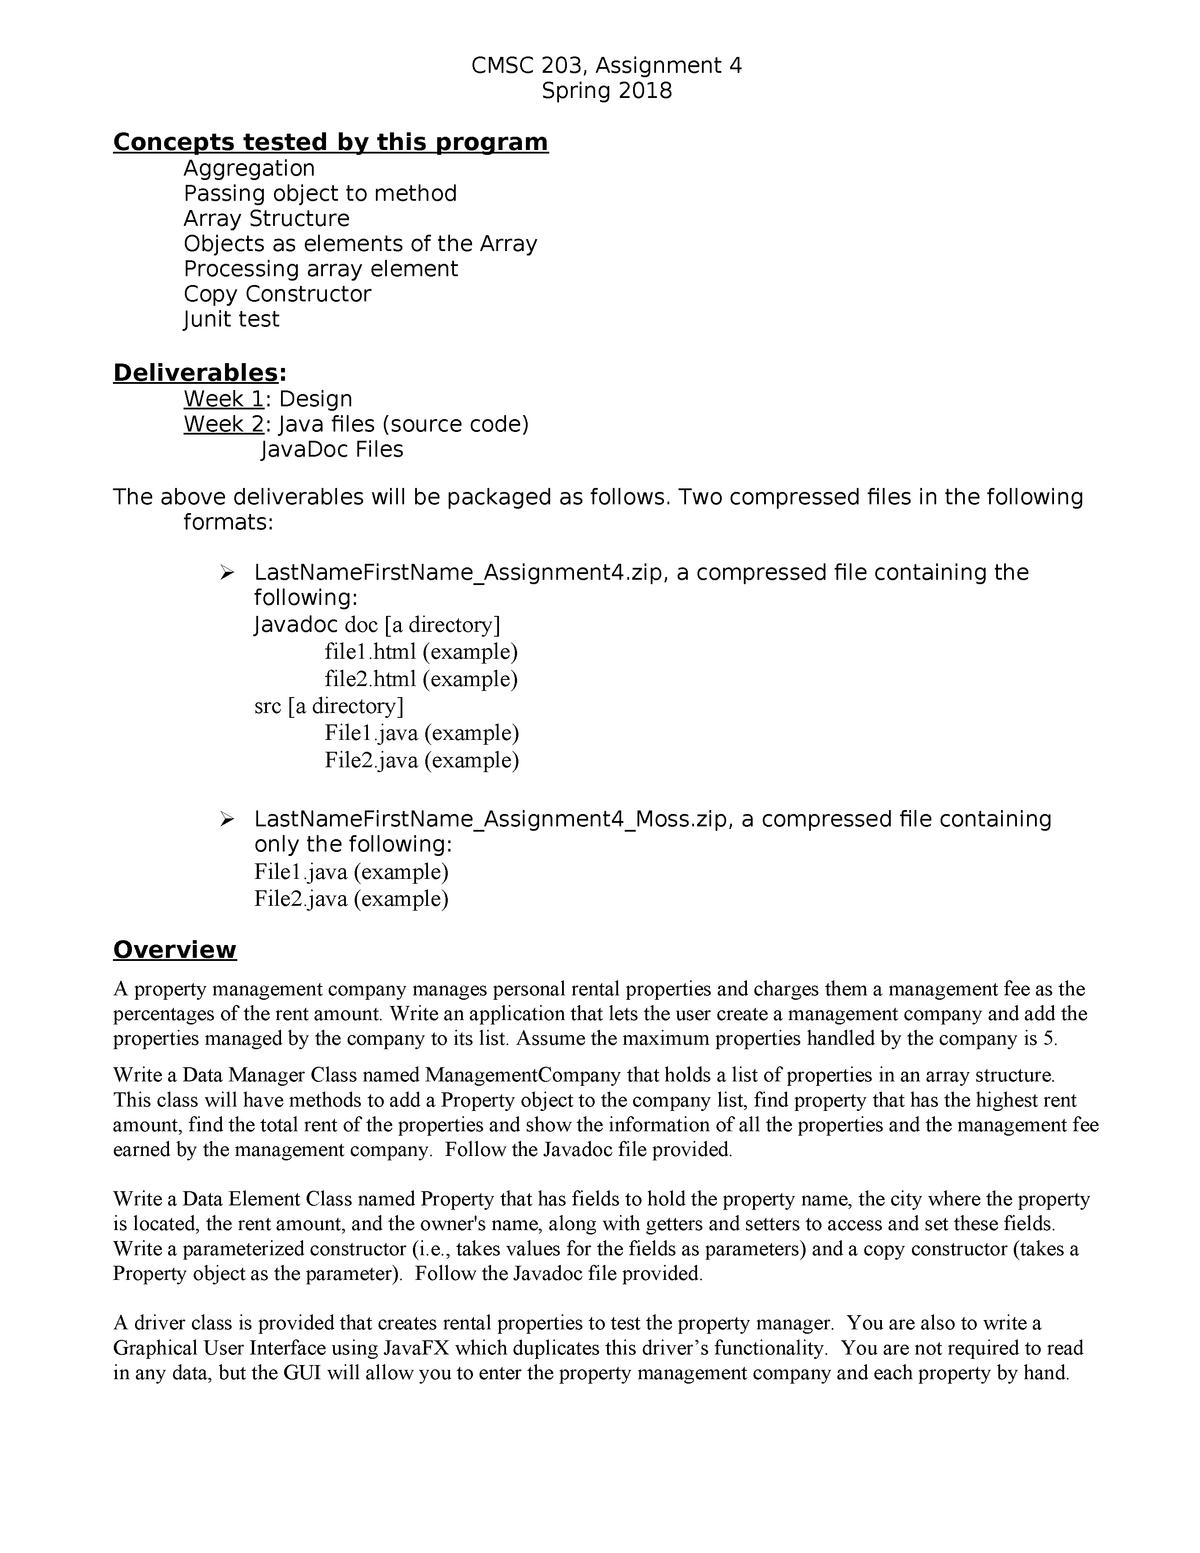 S2018 Assignment 4 w GUI - CS 103 Computer Science I - StuDocu